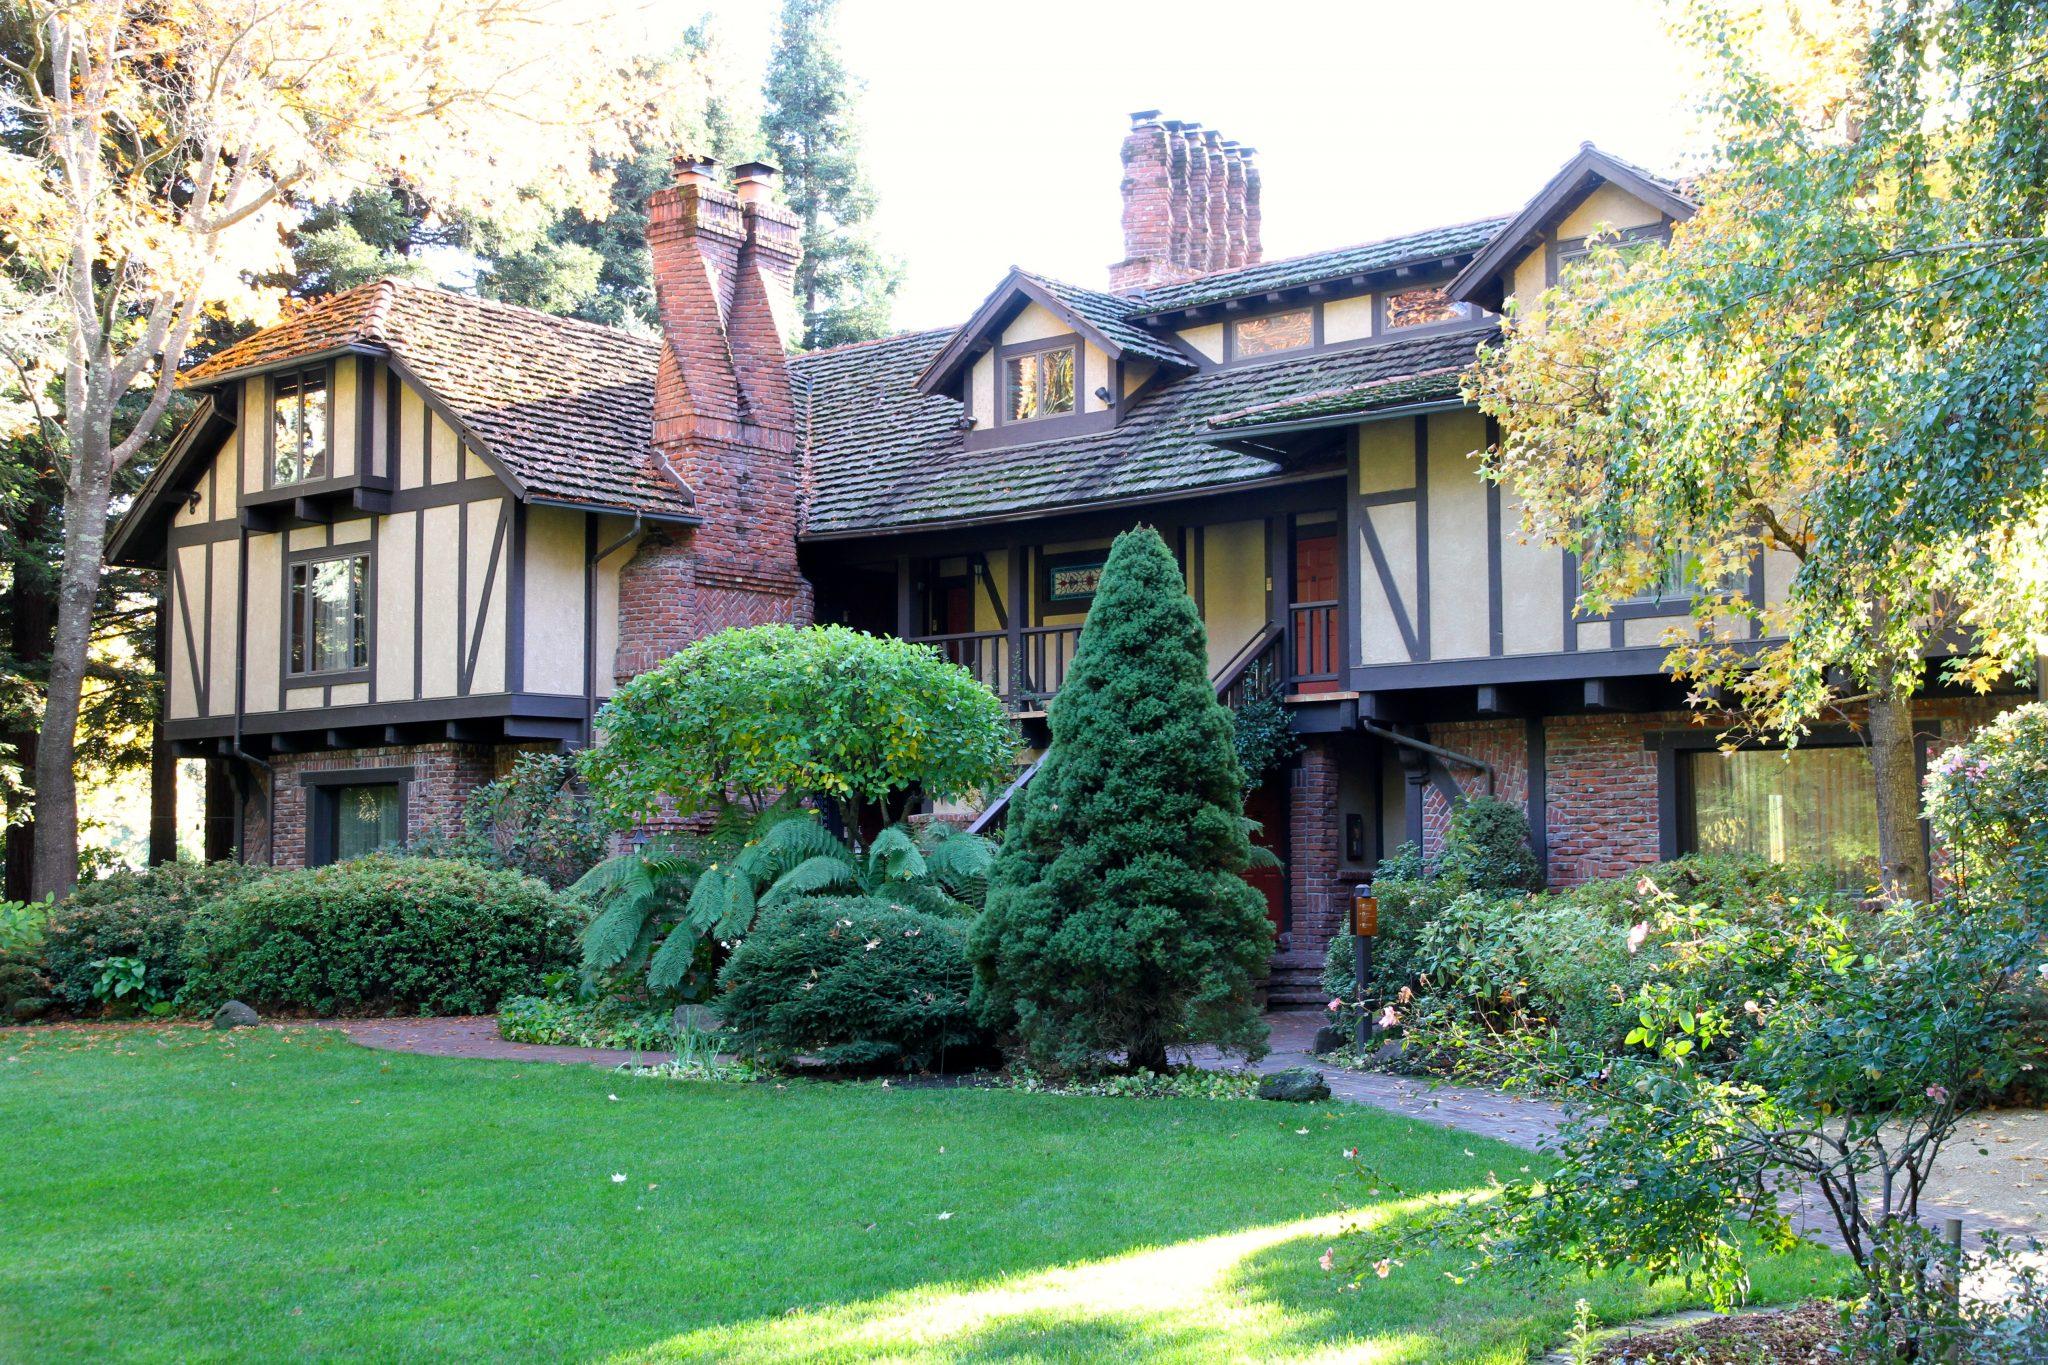 Manor building at Harvest Inn in Napa Valley